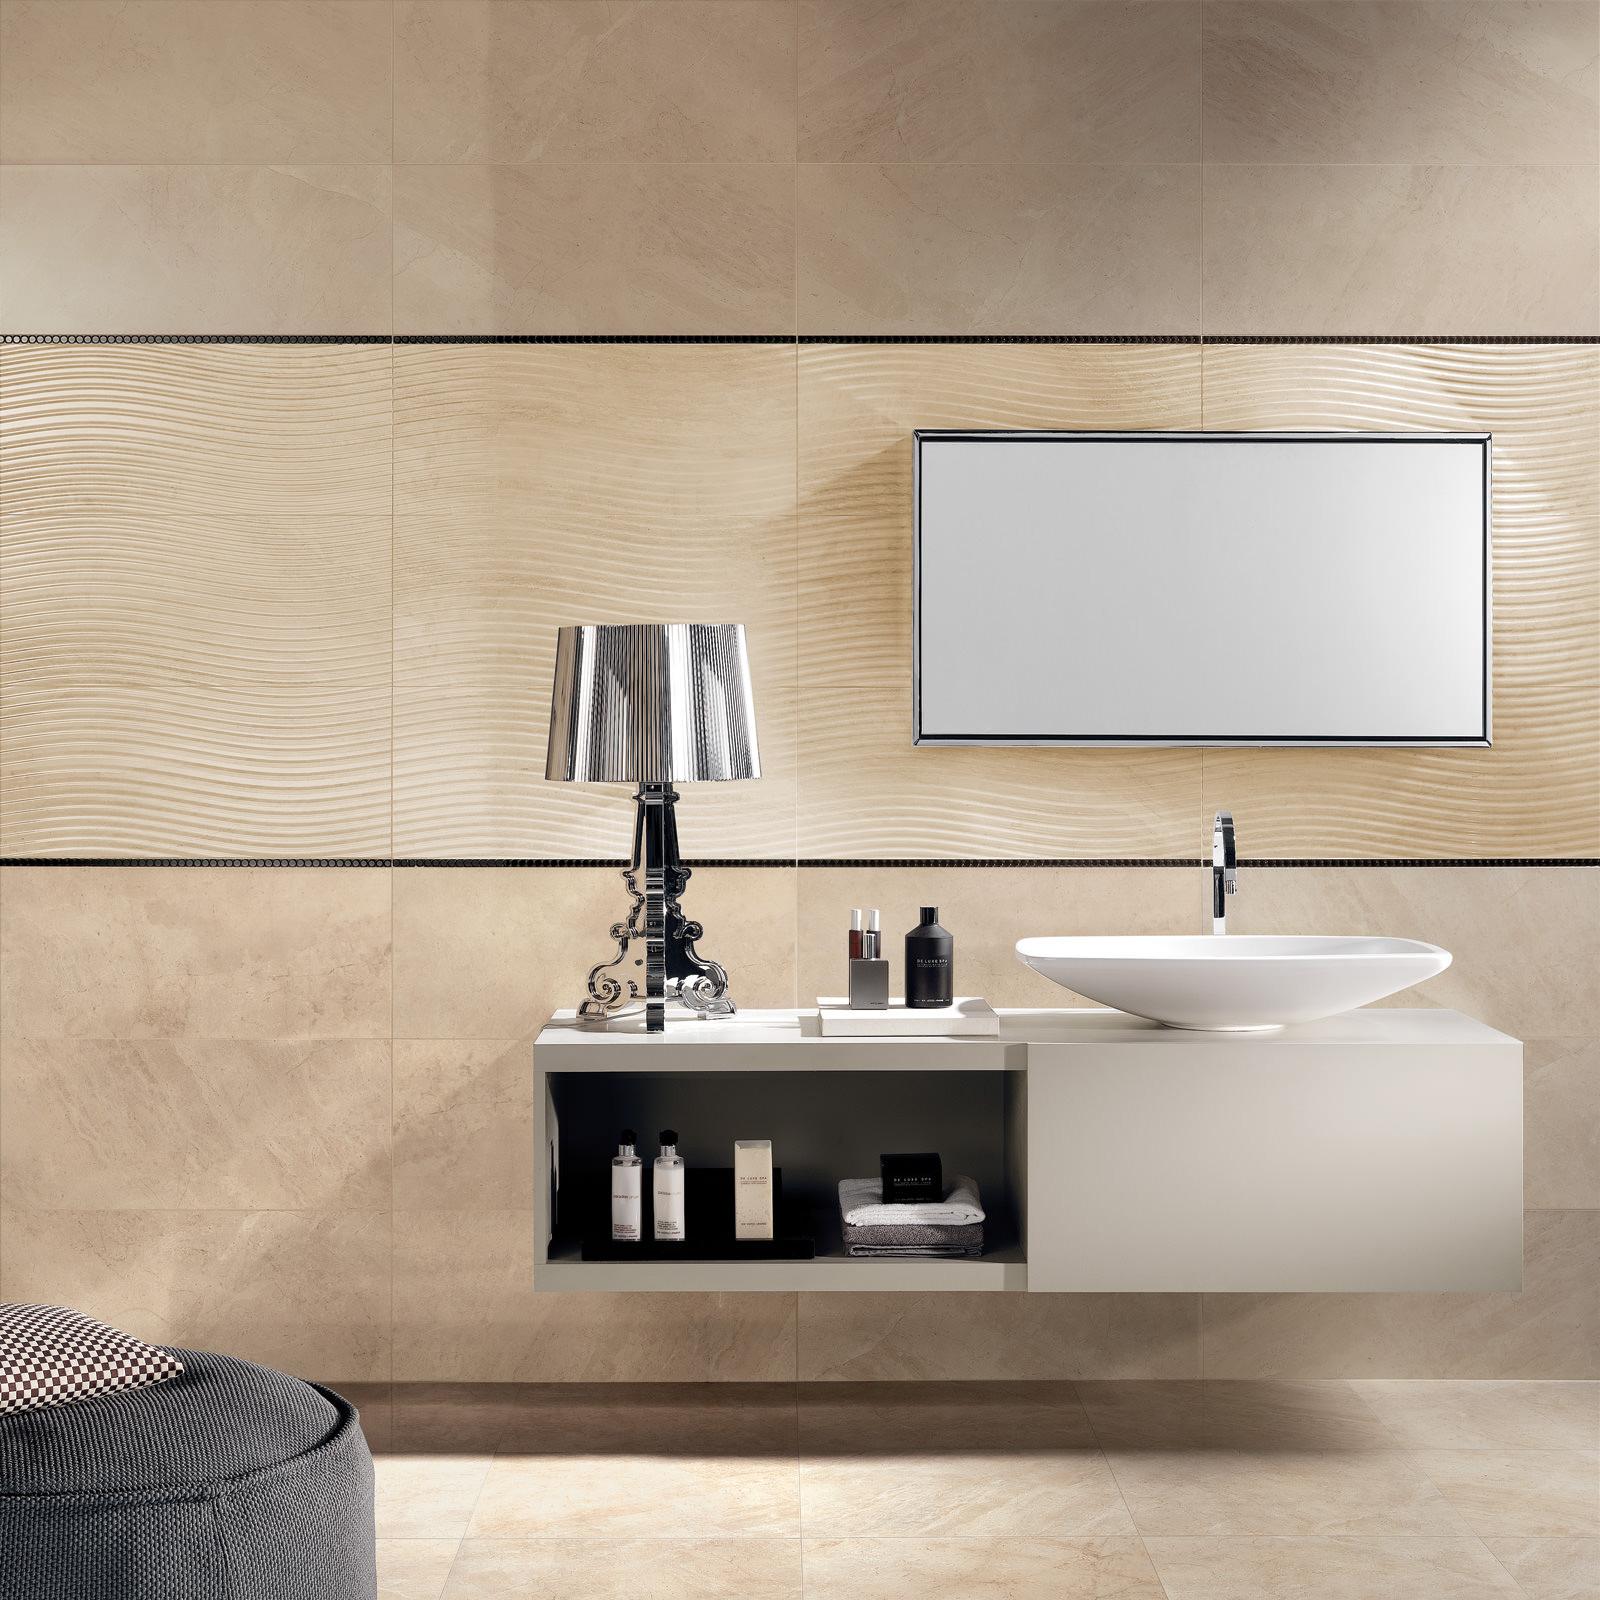 marmo d bianco onda travertine effect wall tile. Black Bedroom Furniture Sets. Home Design Ideas